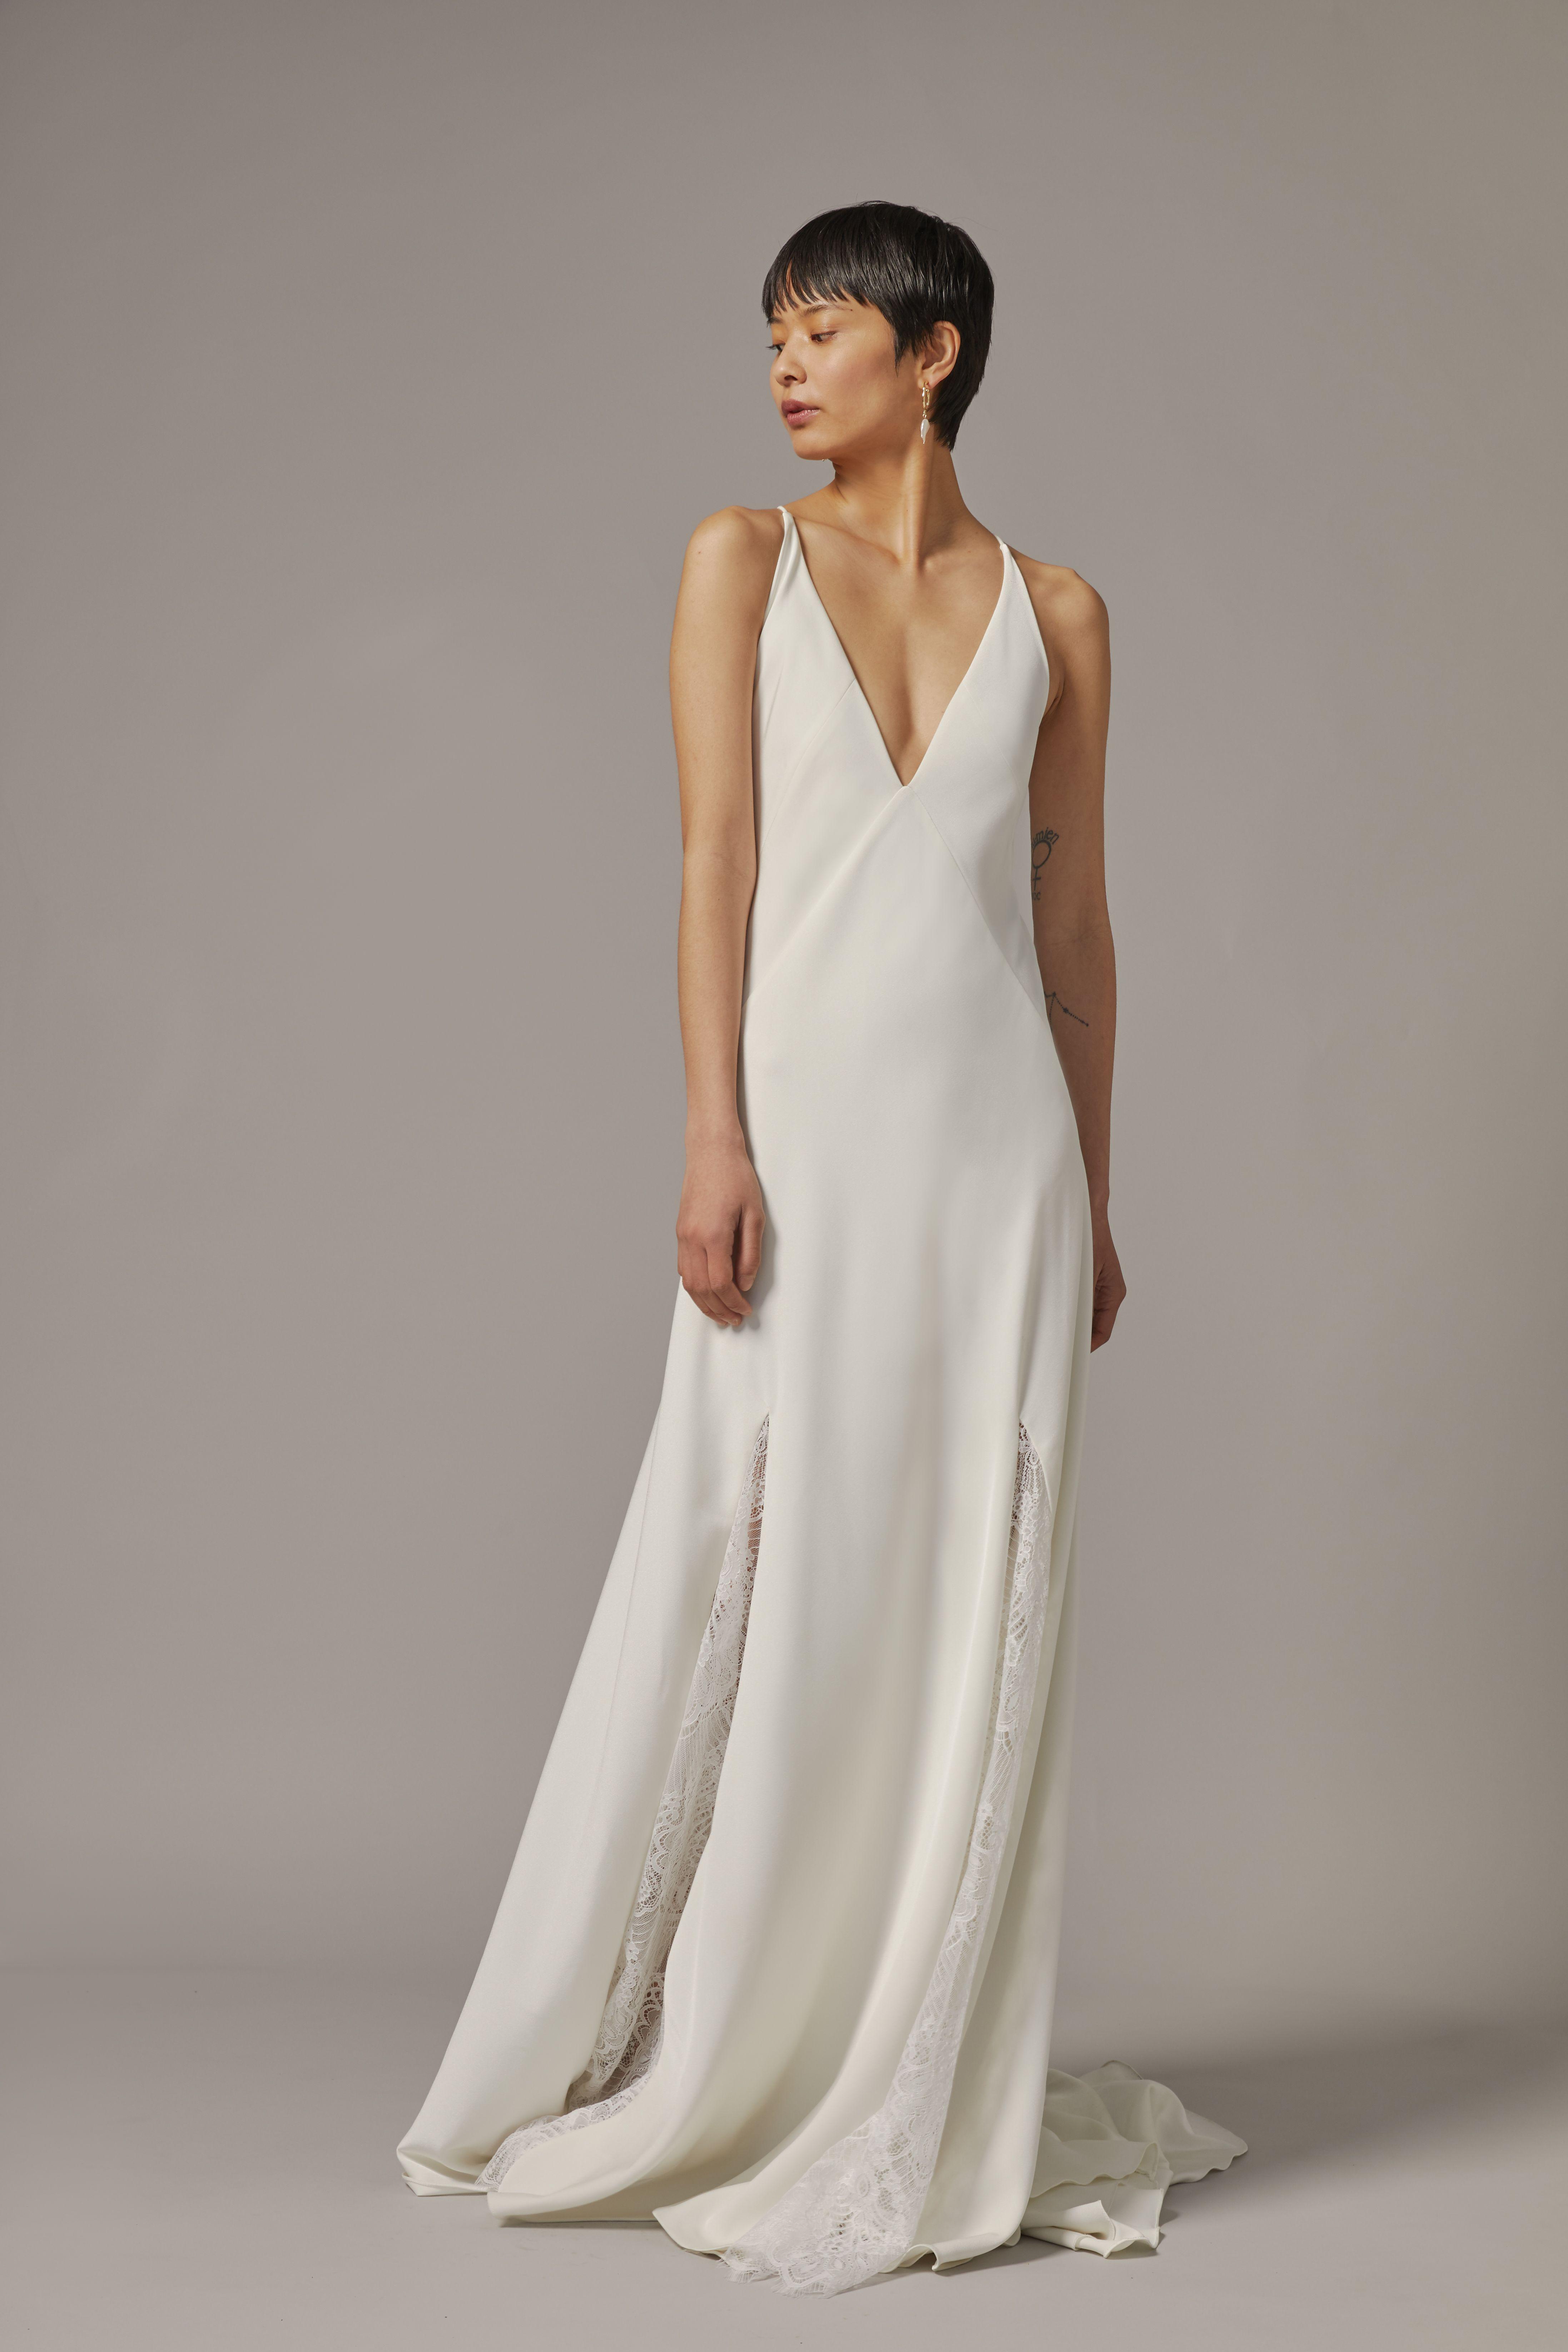 N Simone Dream Wedding Dresses Dresses Most Beautiful Wedding Dresses